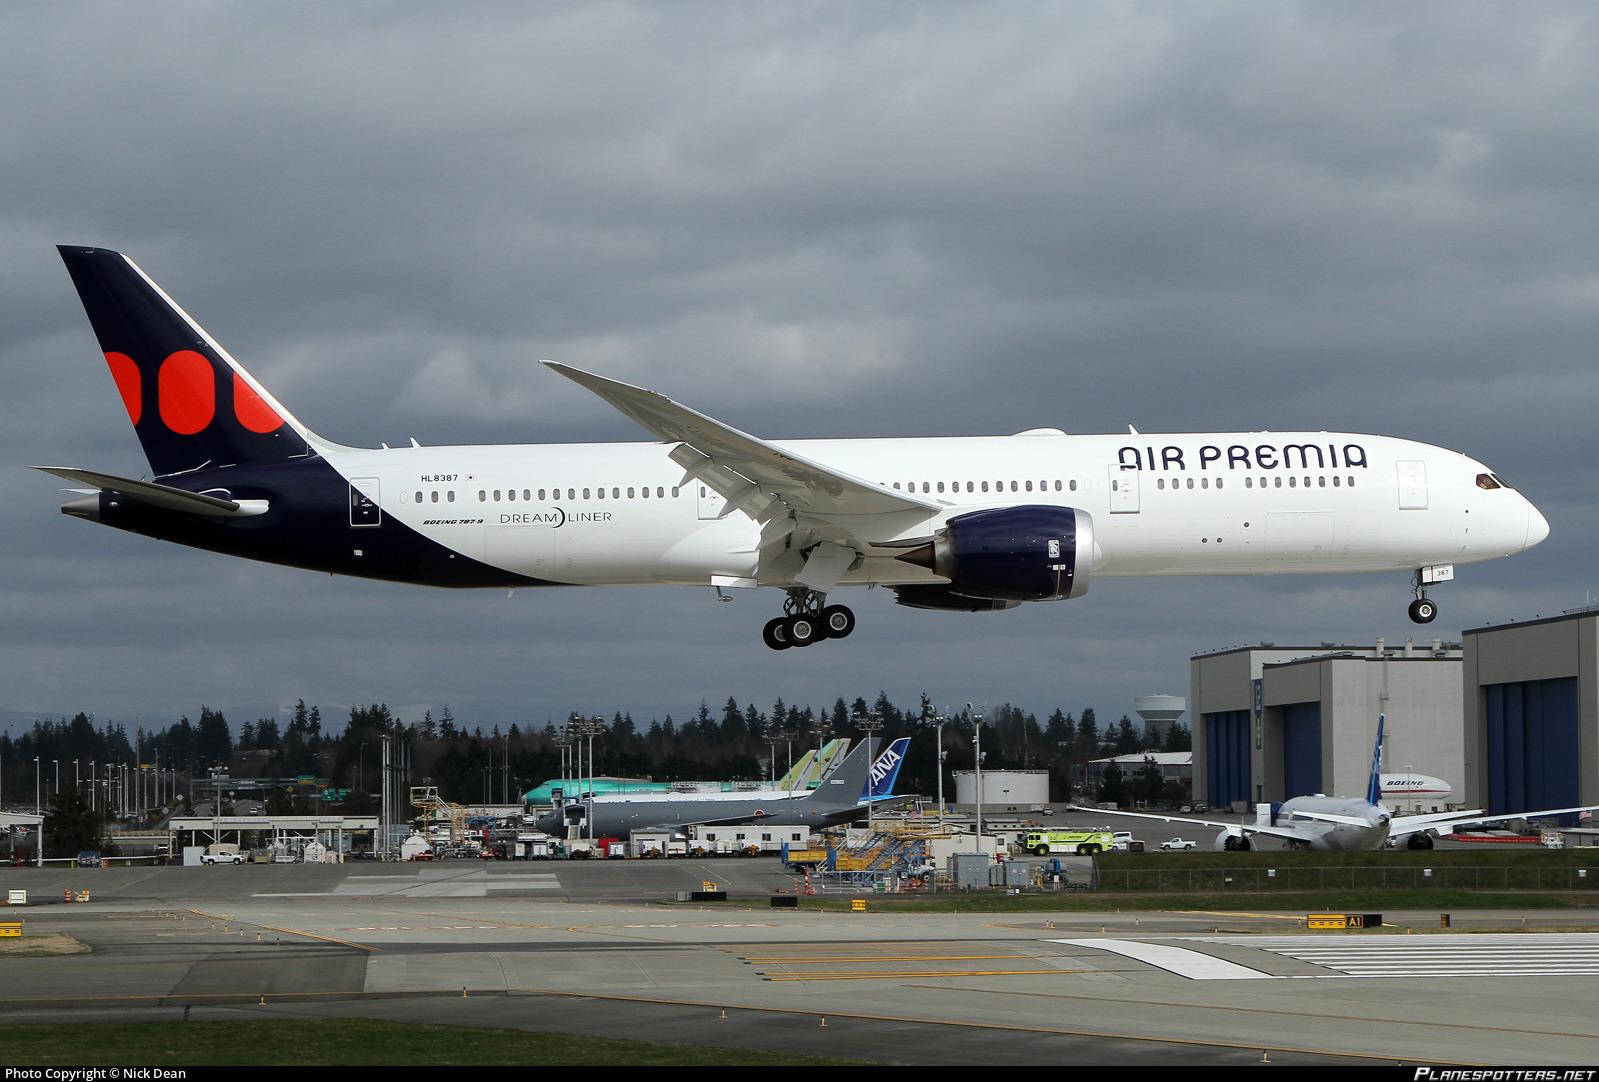 hl8387-air-premia-boeing-787-9-dreamliner_PlanespottersNet_1166225_e2ddcabc93_o.jpg